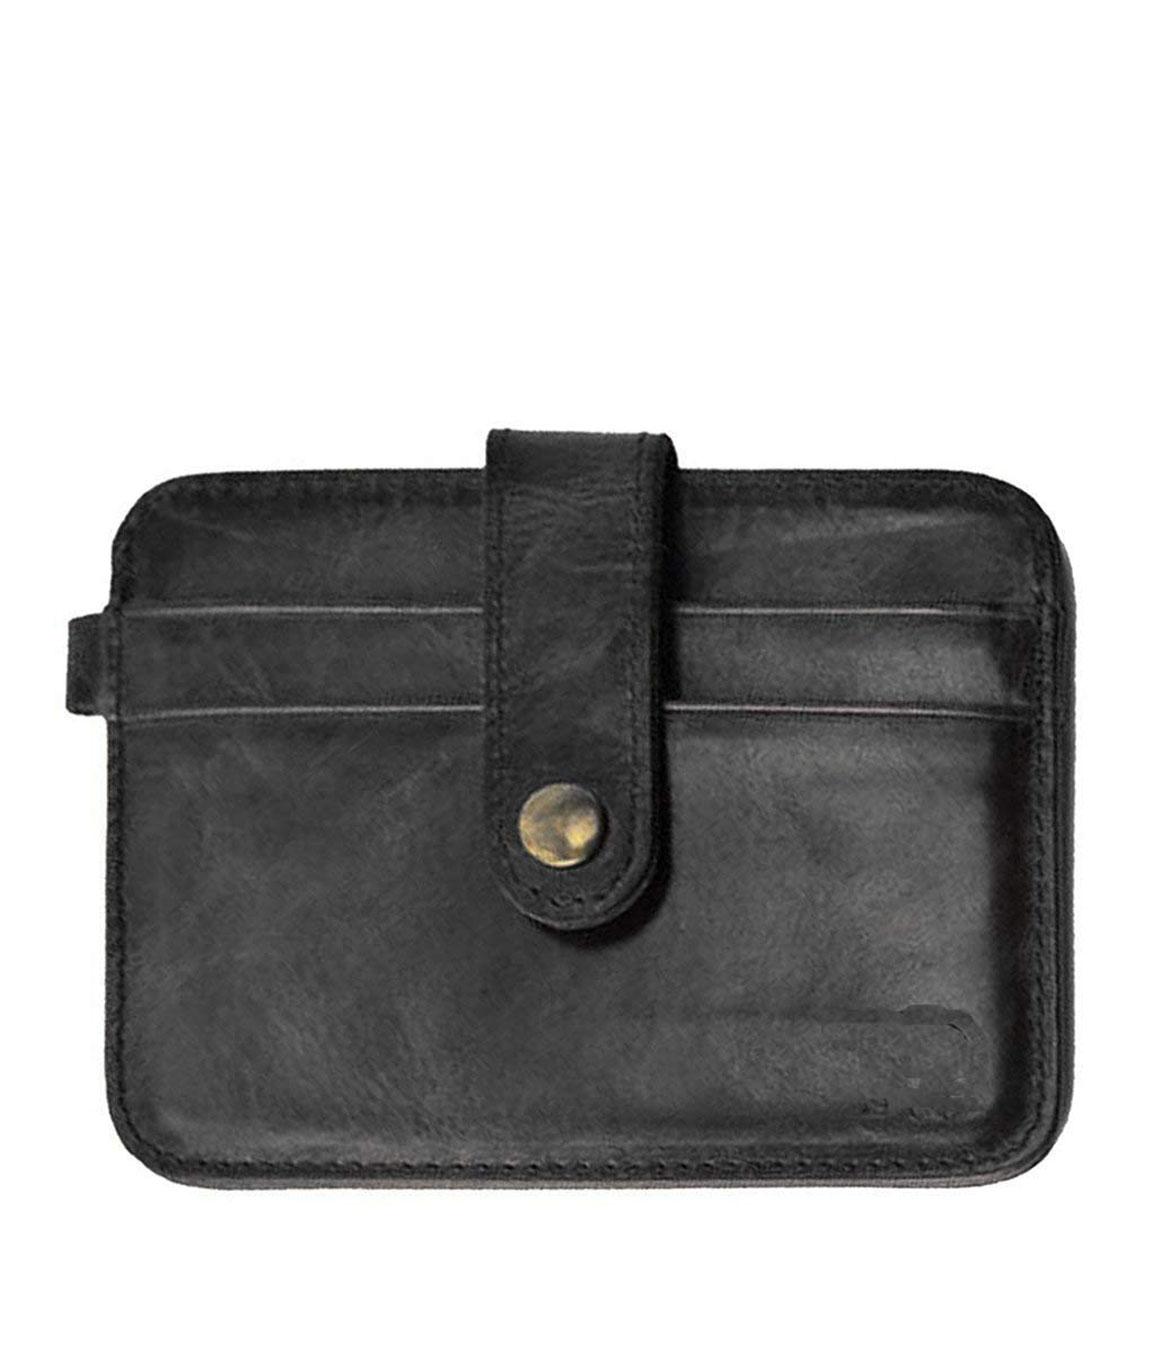 ZORO Black Men`s Faux Leather Credit Debit Case Wallet